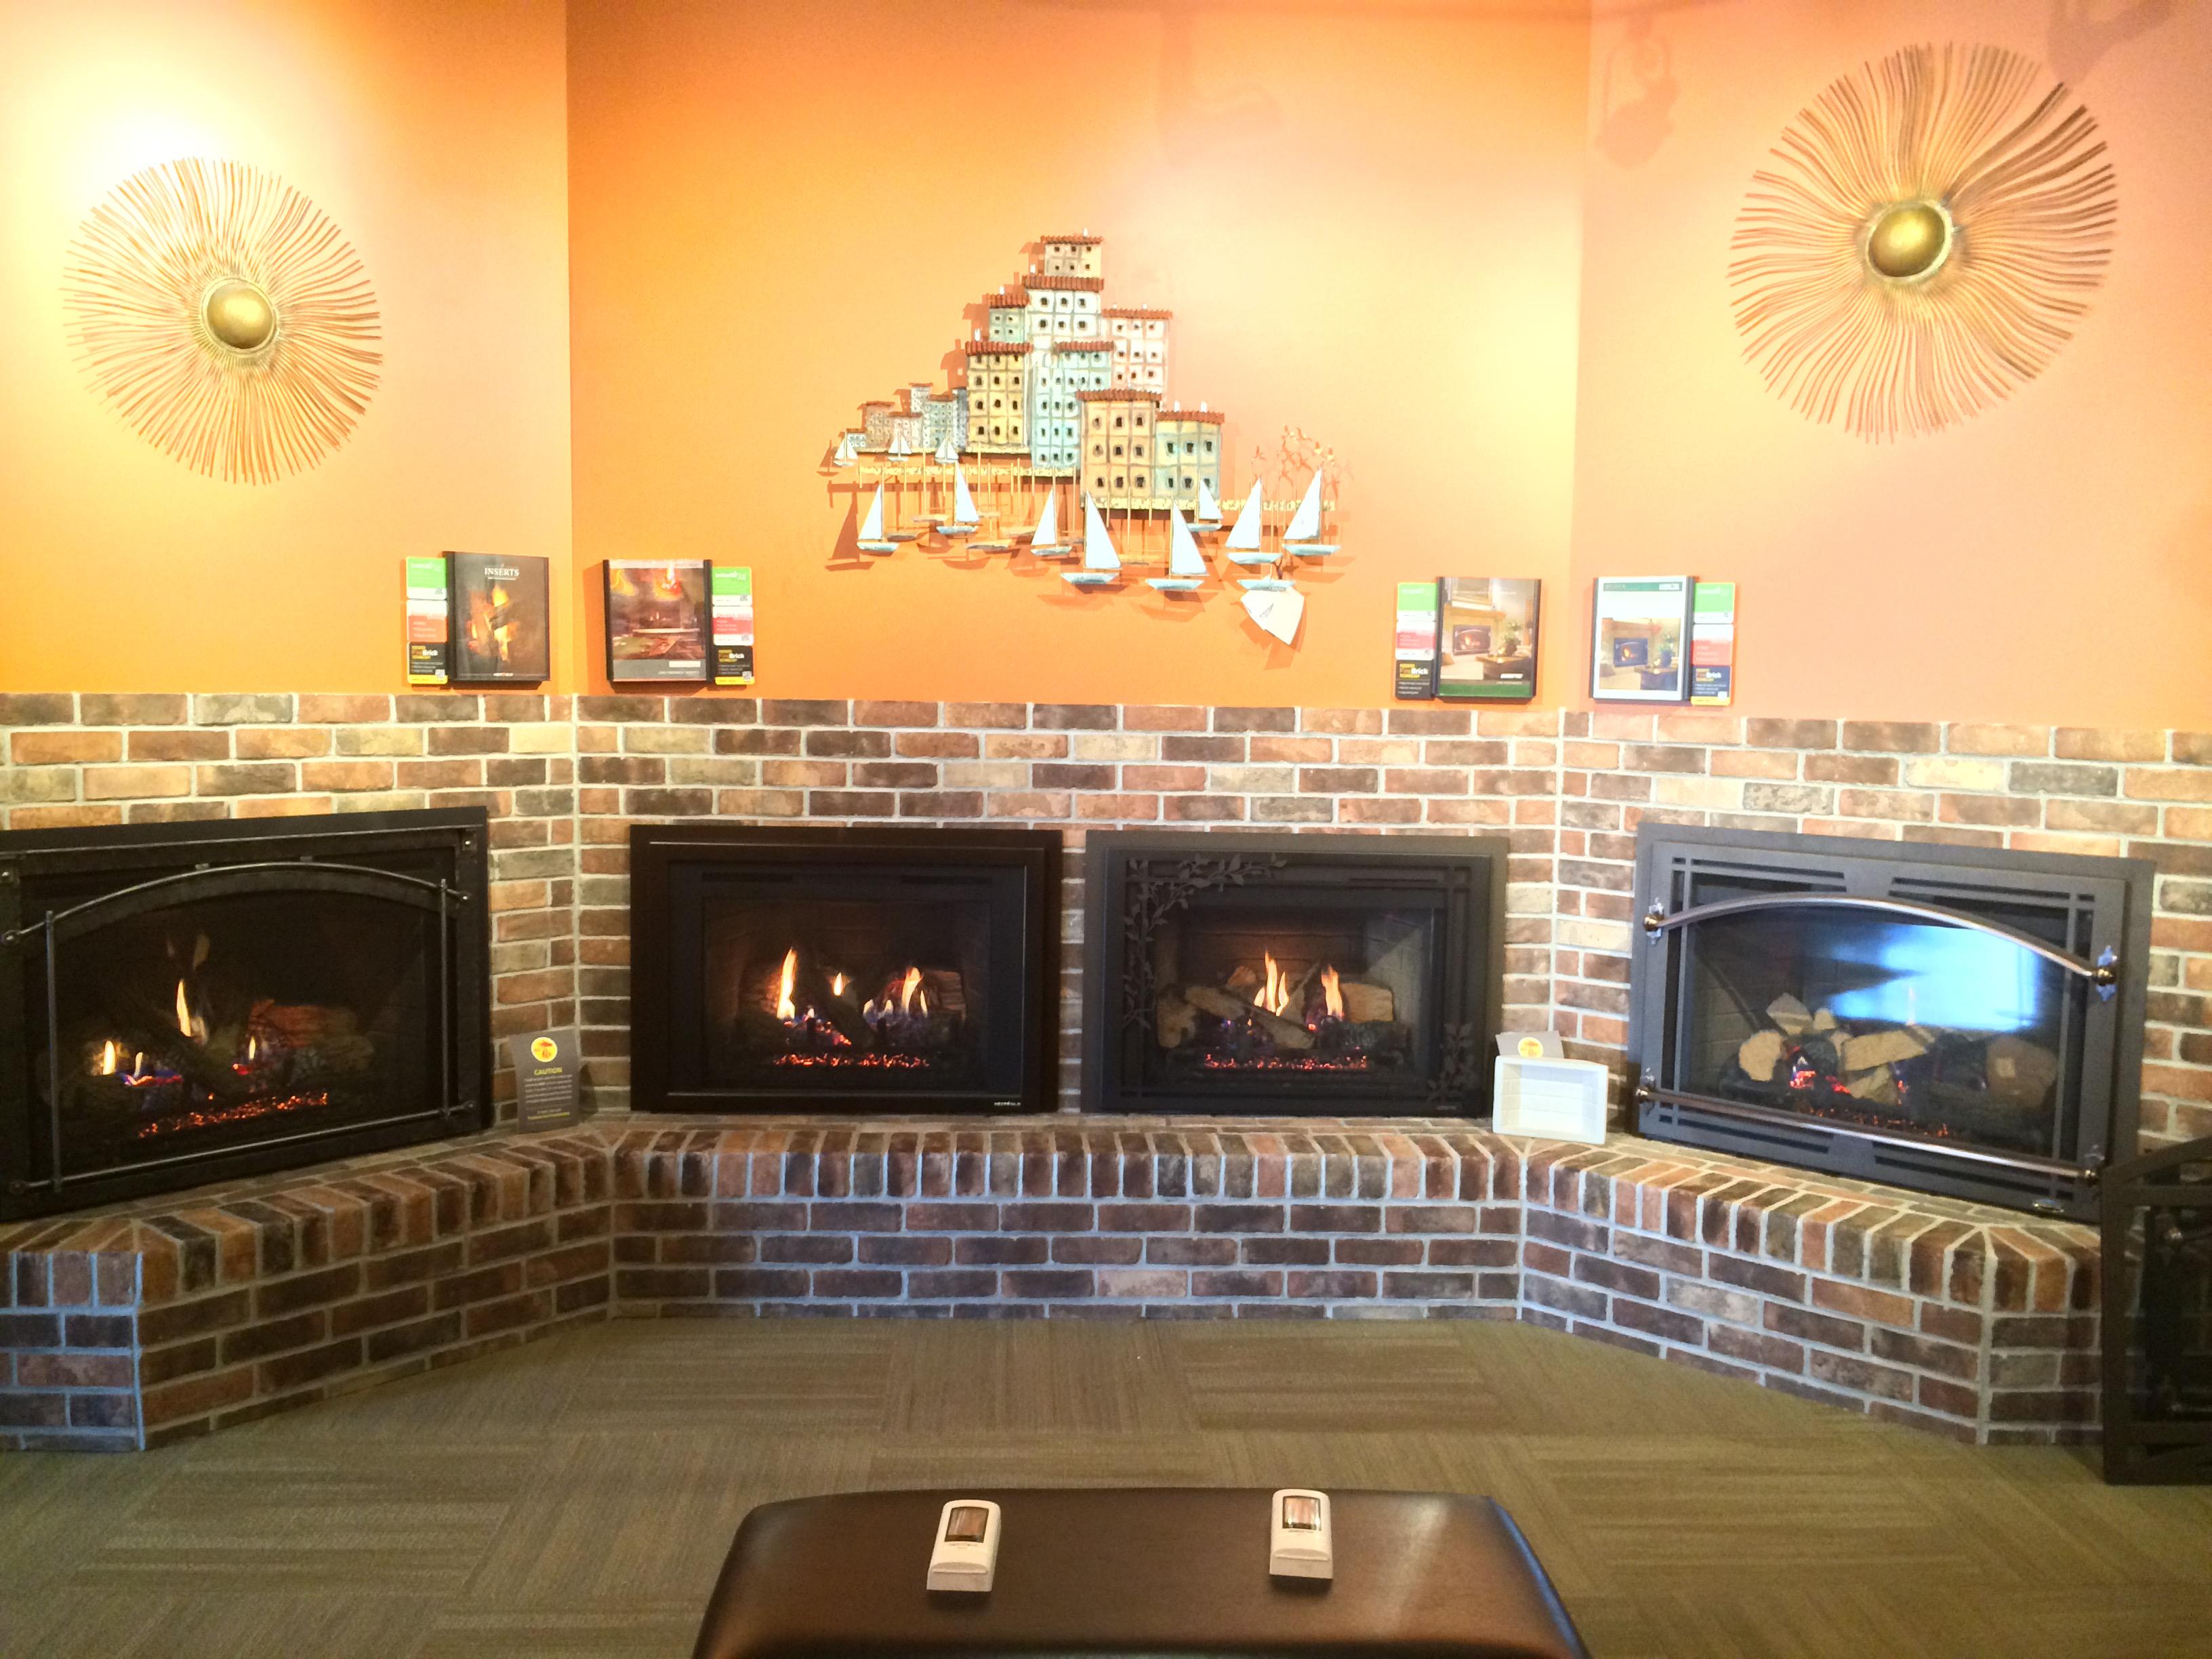 Alaskan Fireplace image 4